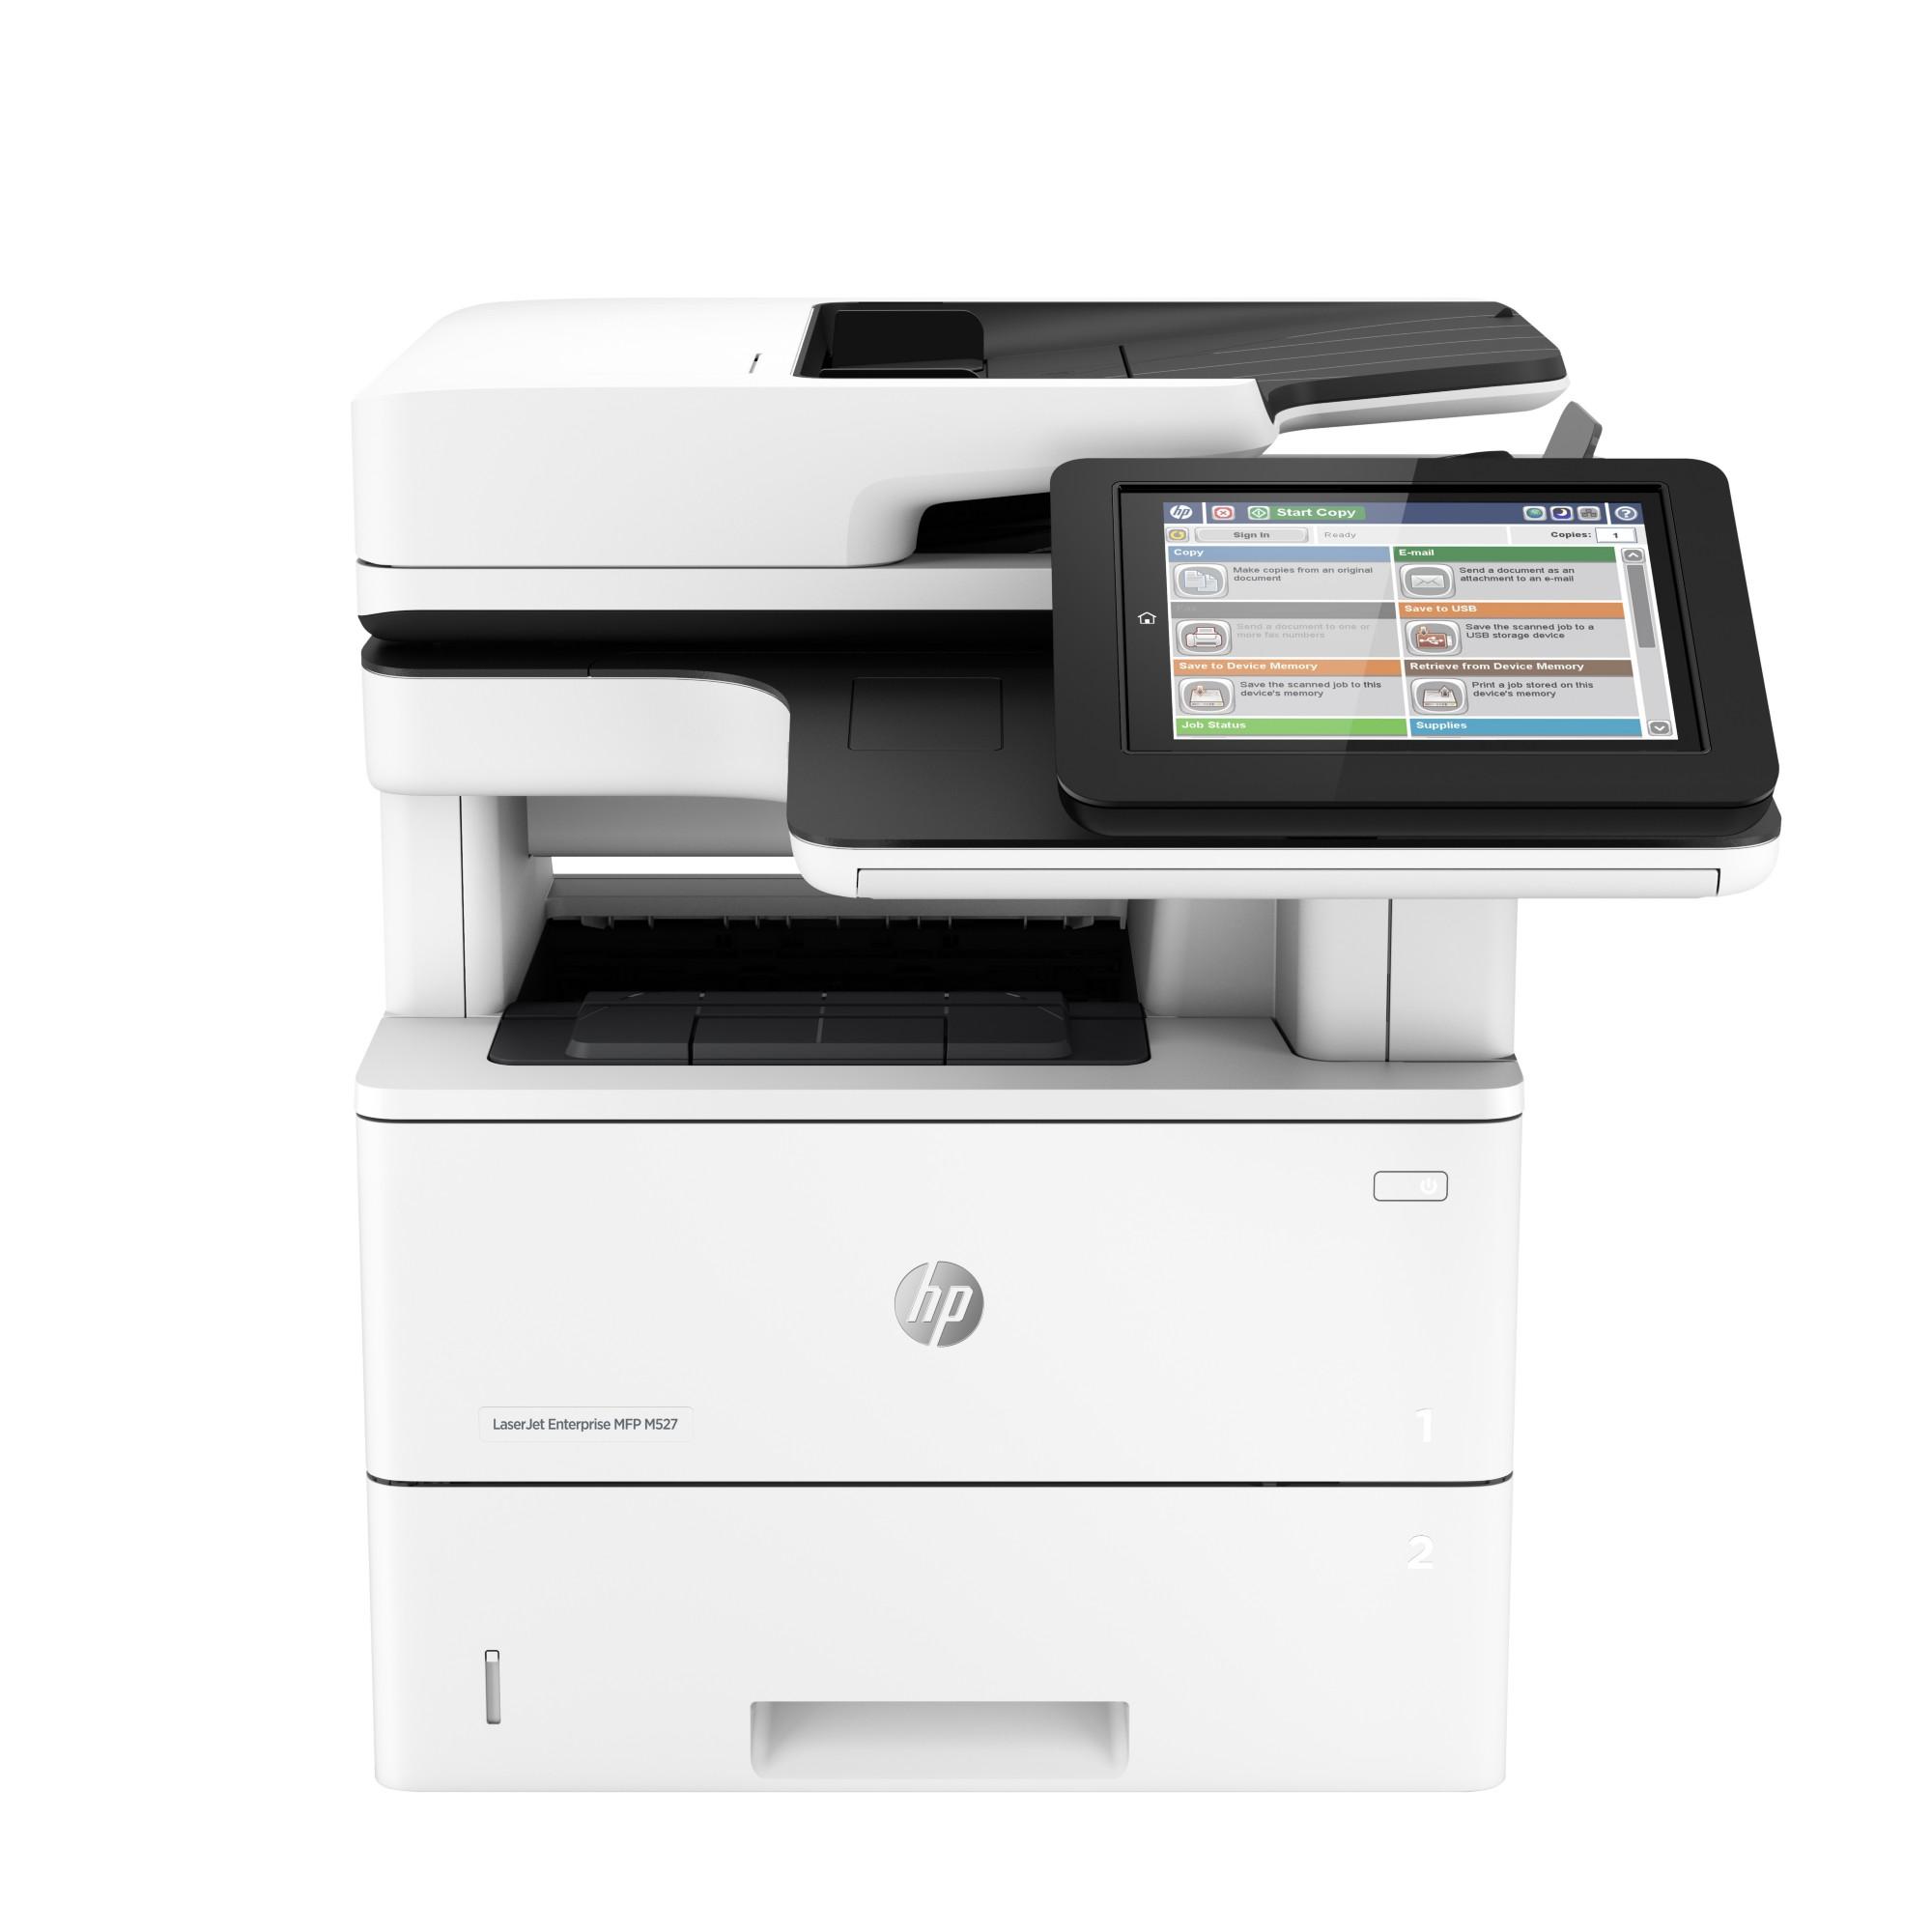 HP LaserJet Enterprise MFP M527f 1200 x 1200DPI Laser A4 43ppm